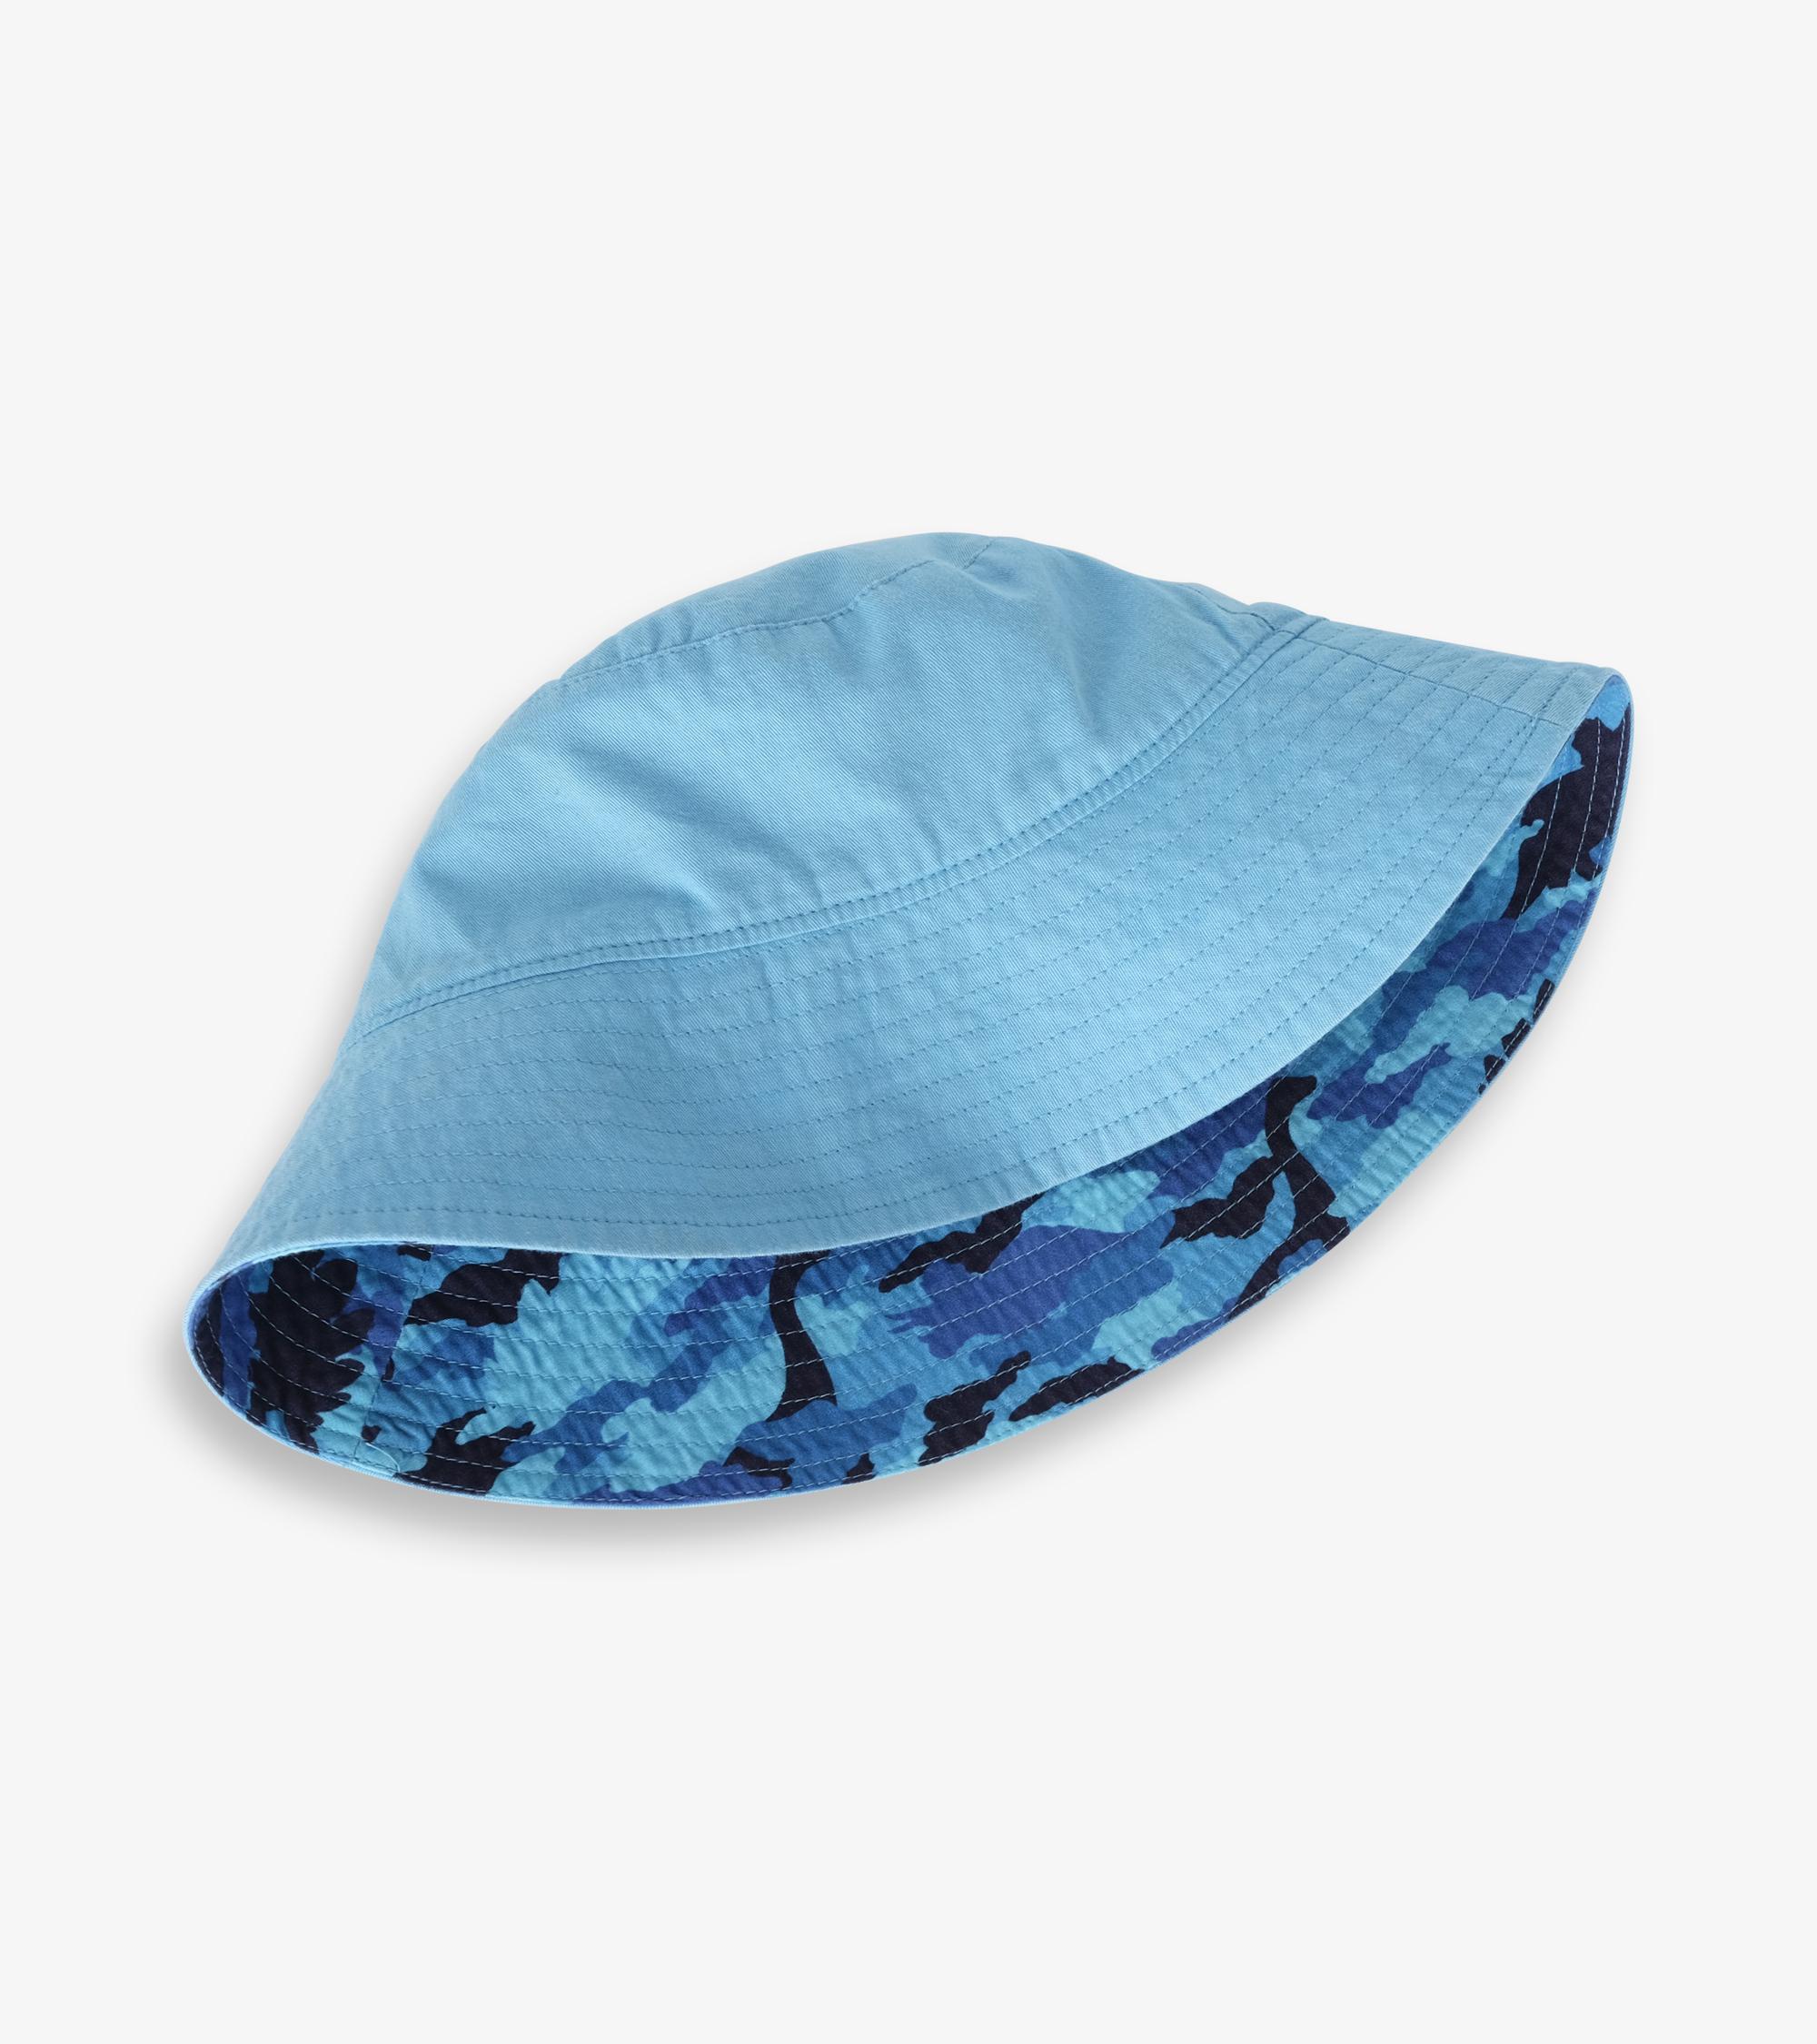 Hatley Dino Camo Reversible Sun Hat